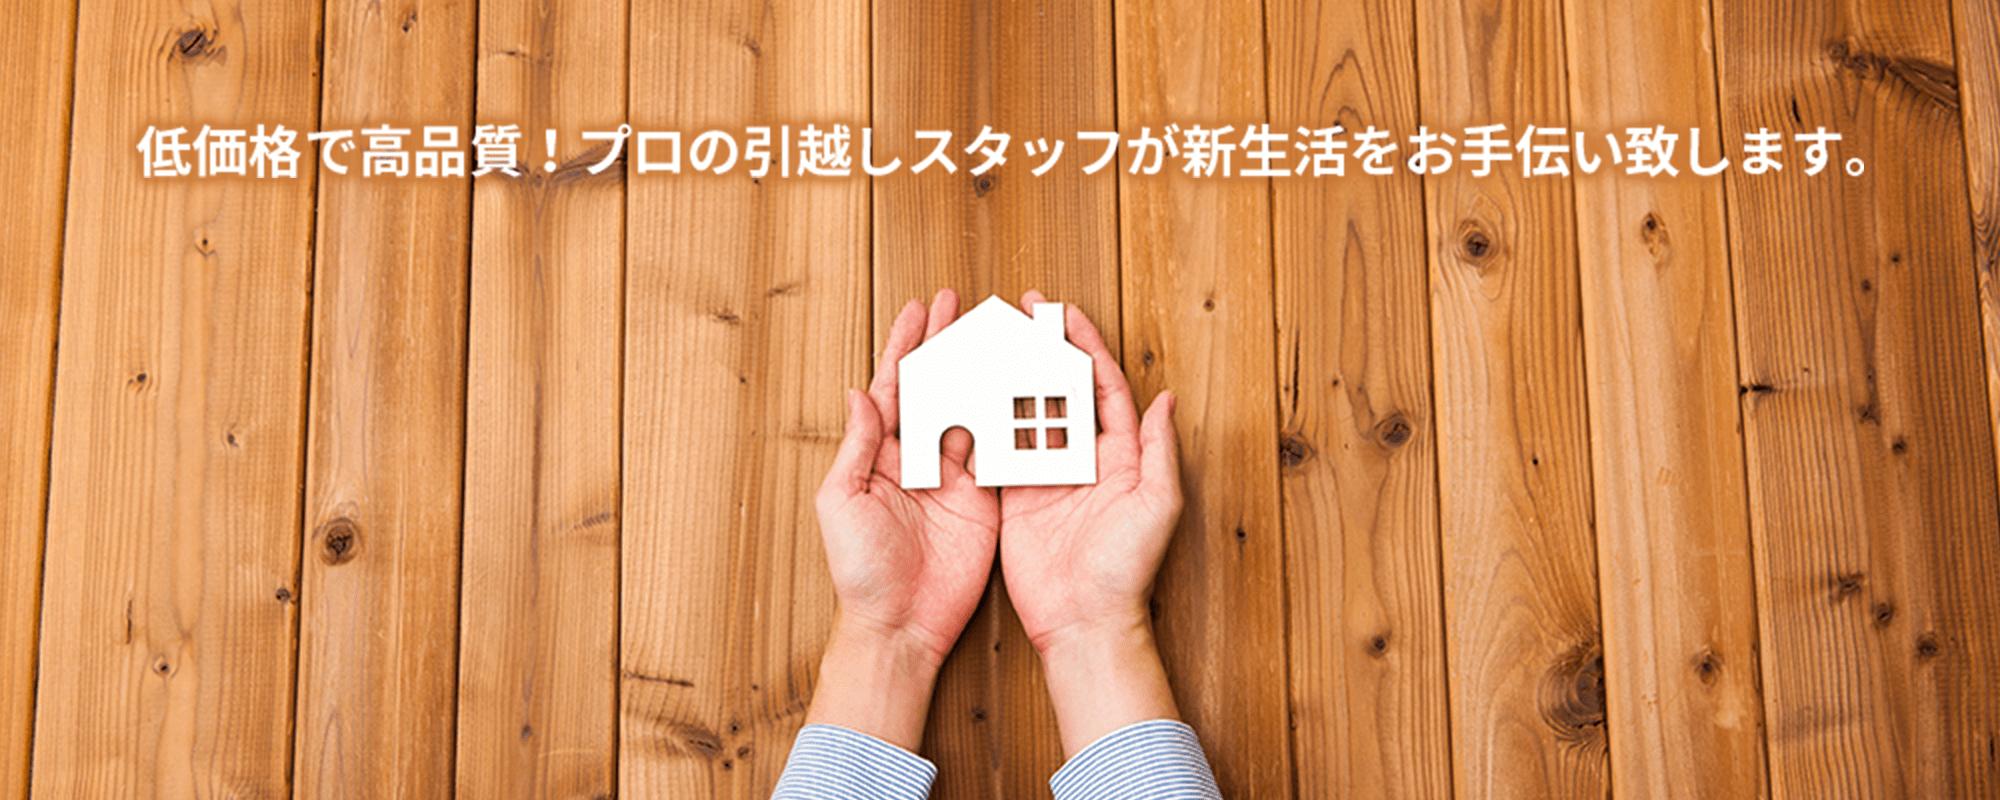 KIZUNAスライド画像01